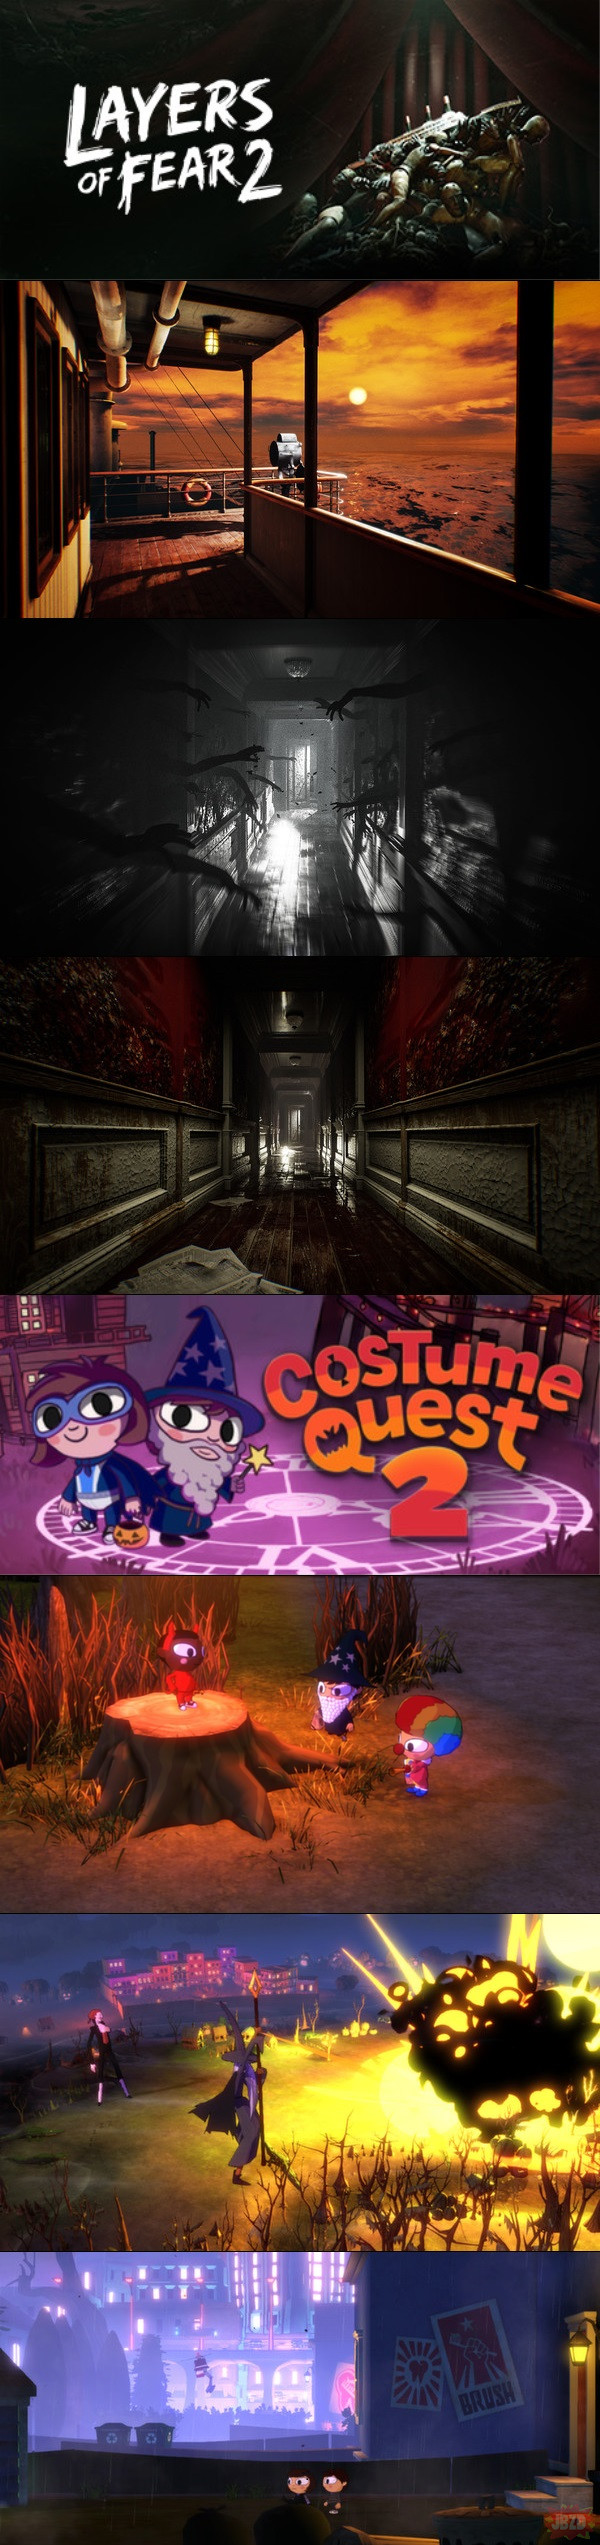 Layers of Fear 2 i Costume Quest 2 za darmo w epic games store